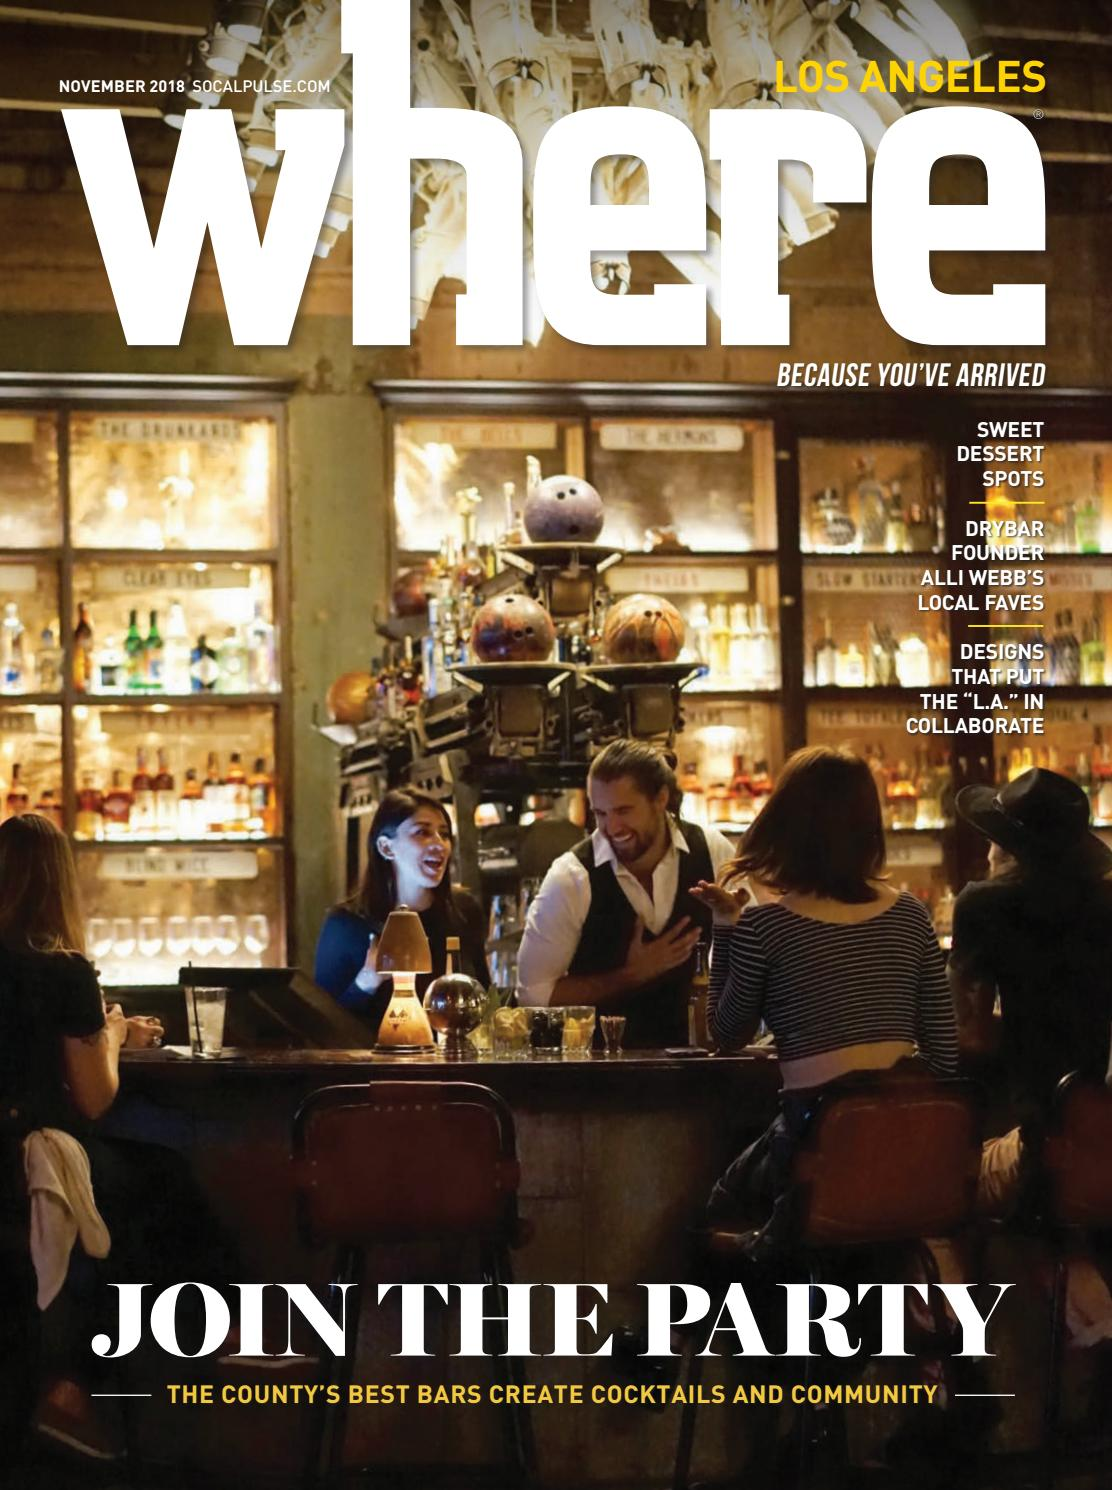 ddeafbb7a449 Where Los Angeles Magazine November 2018 by SoCalMedia - issuu